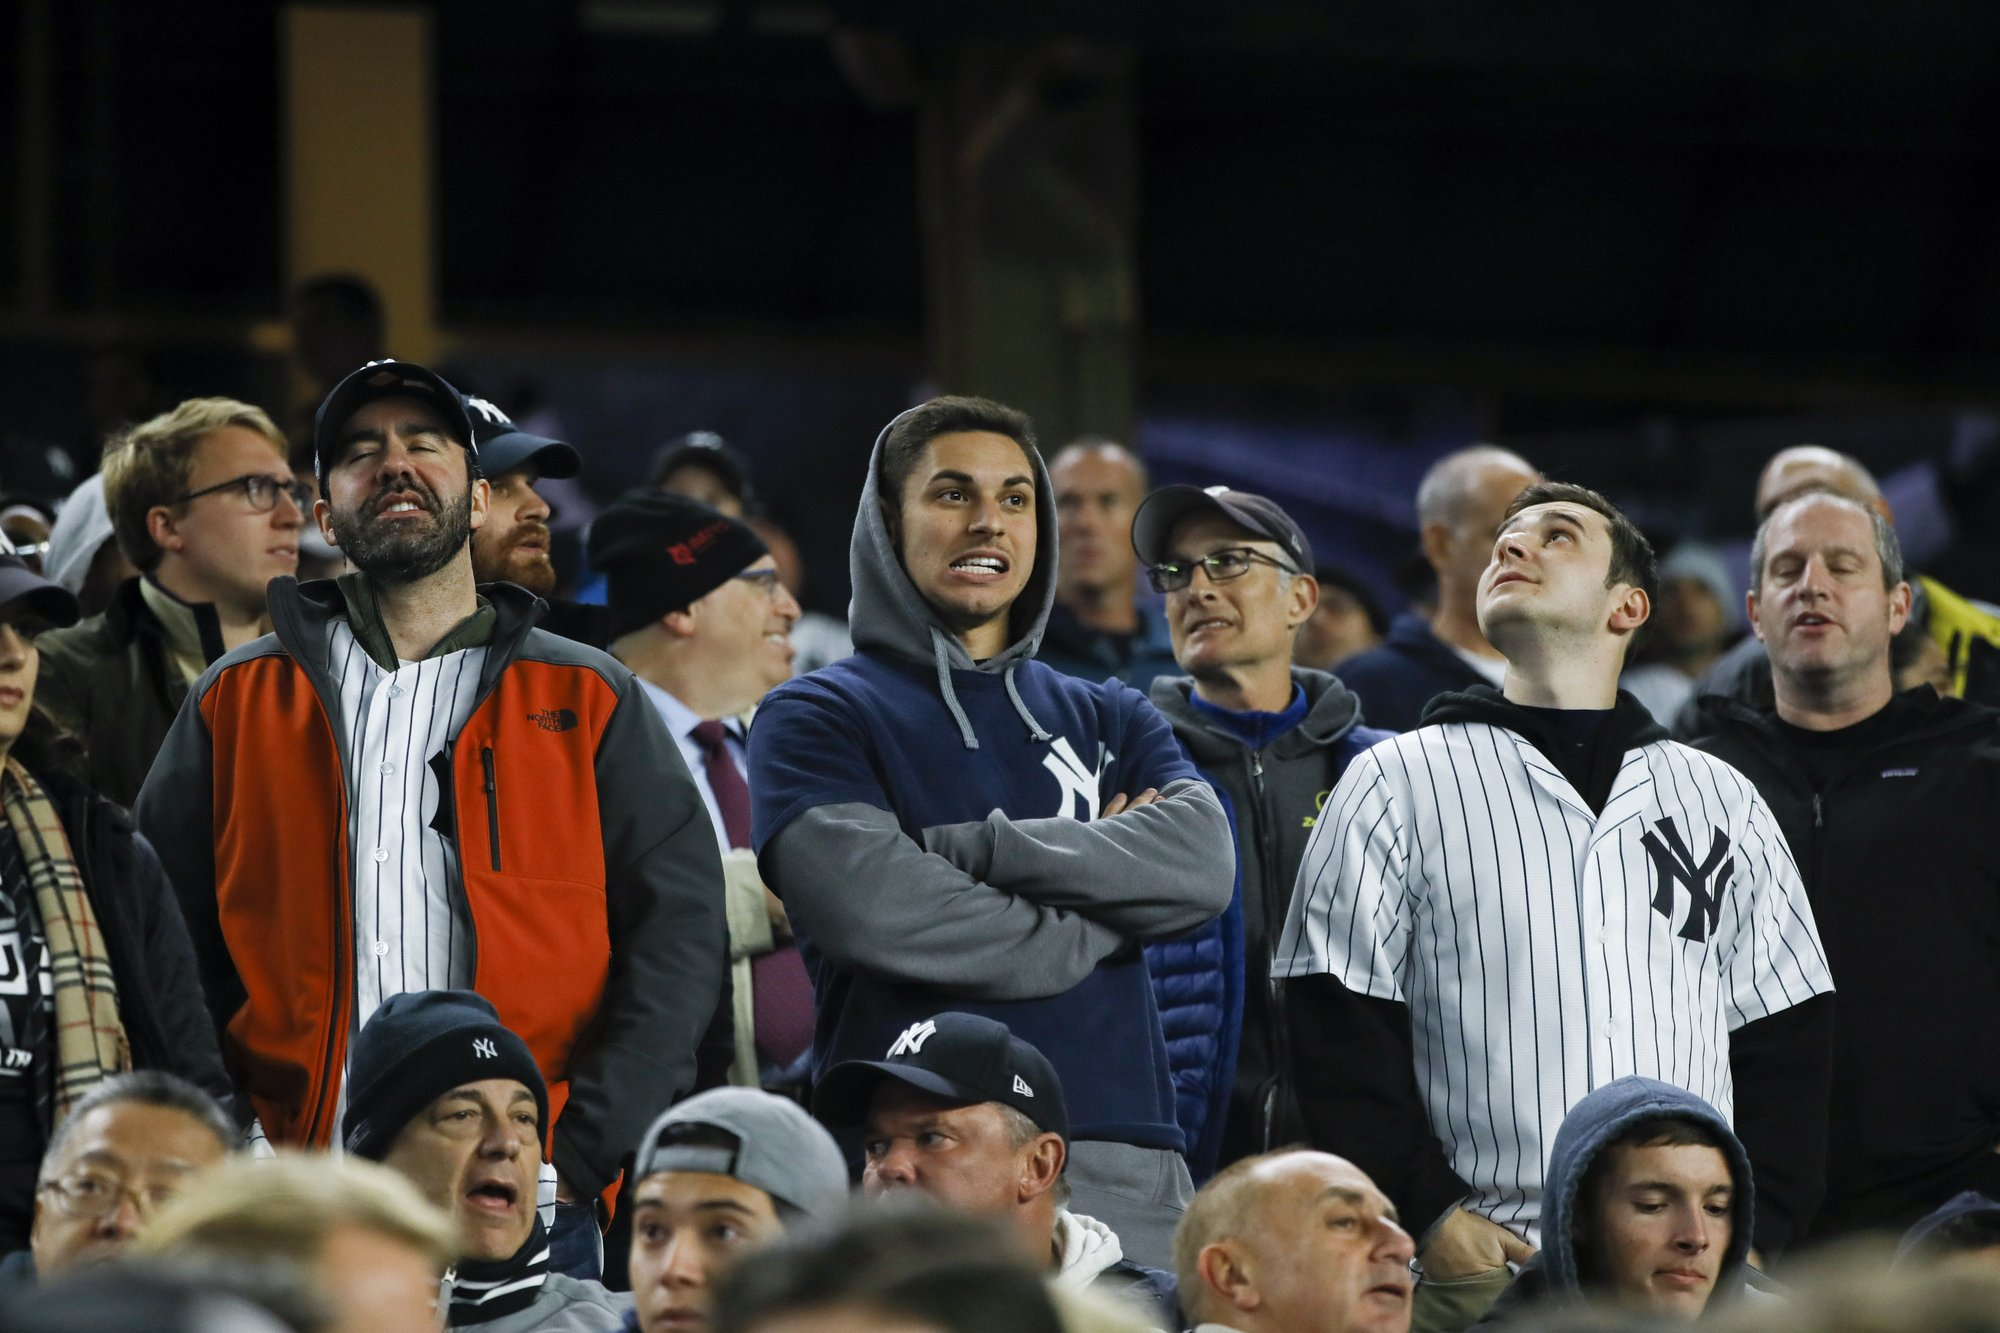 Greinke says he didn't hear taunts, Astros quiet Yanks crowd